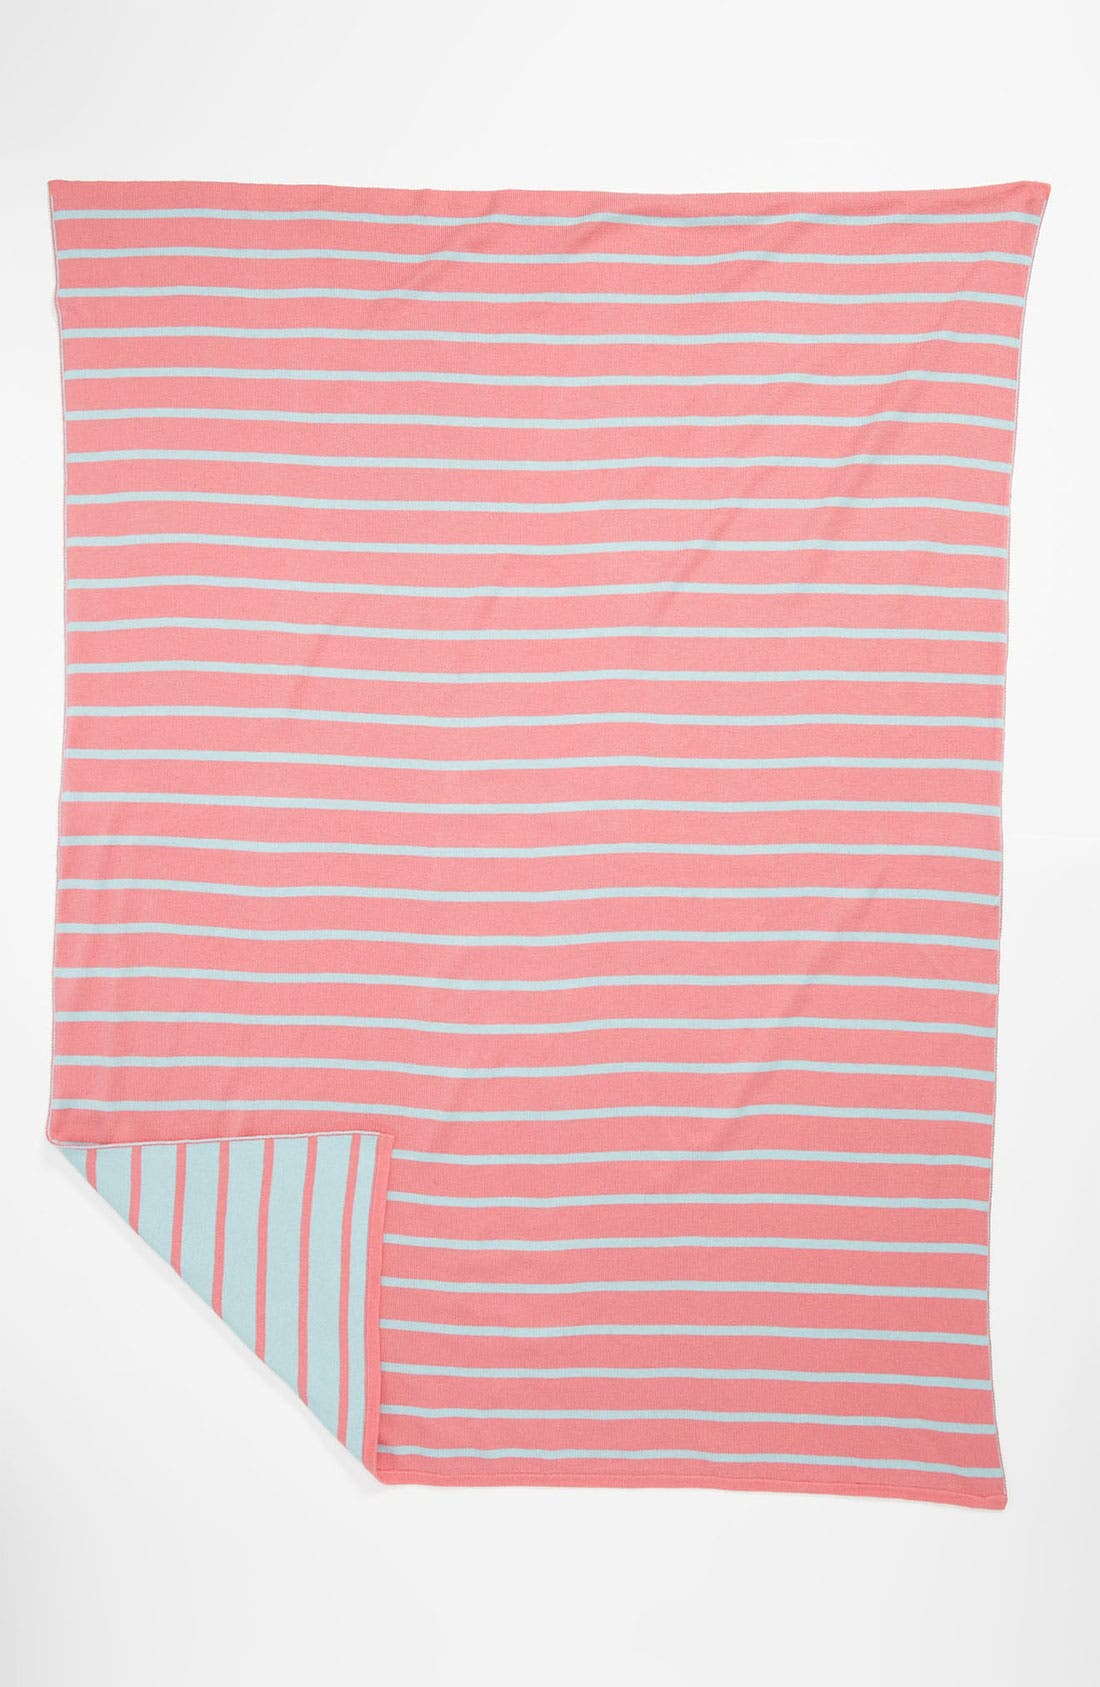 Alternate Image 1 Selected - Stem Baby 'Bright Stripe' Organic Cotton Blanket